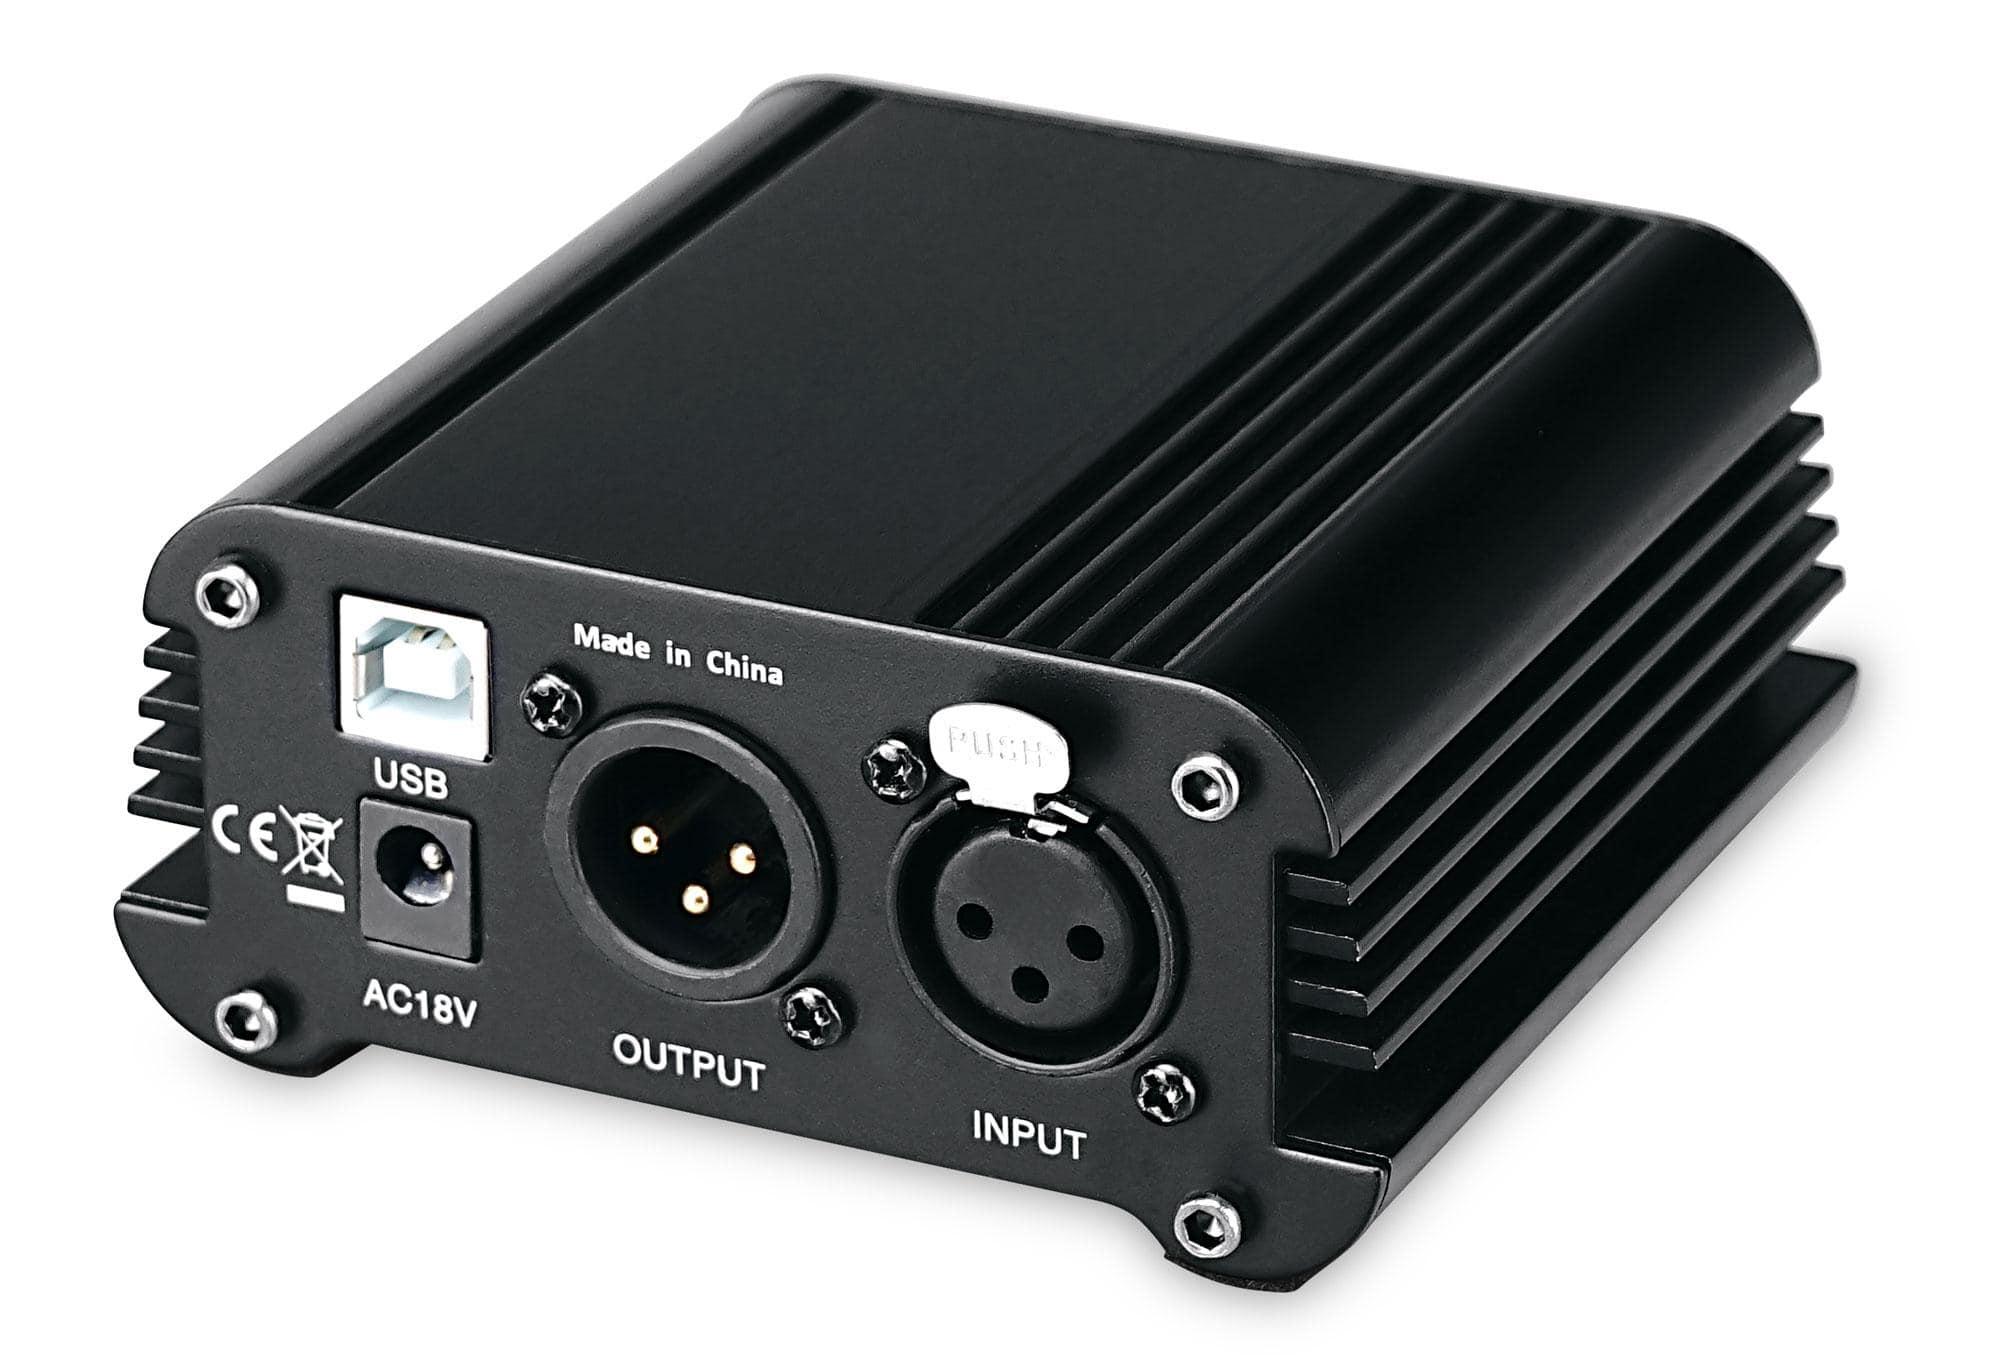 Studiozubehoer - Pronomic PP 10 USB Phantomspeisung mit Audiointerface Retoure (Zustand sehr gut) - Onlineshop Musikhaus Kirstein